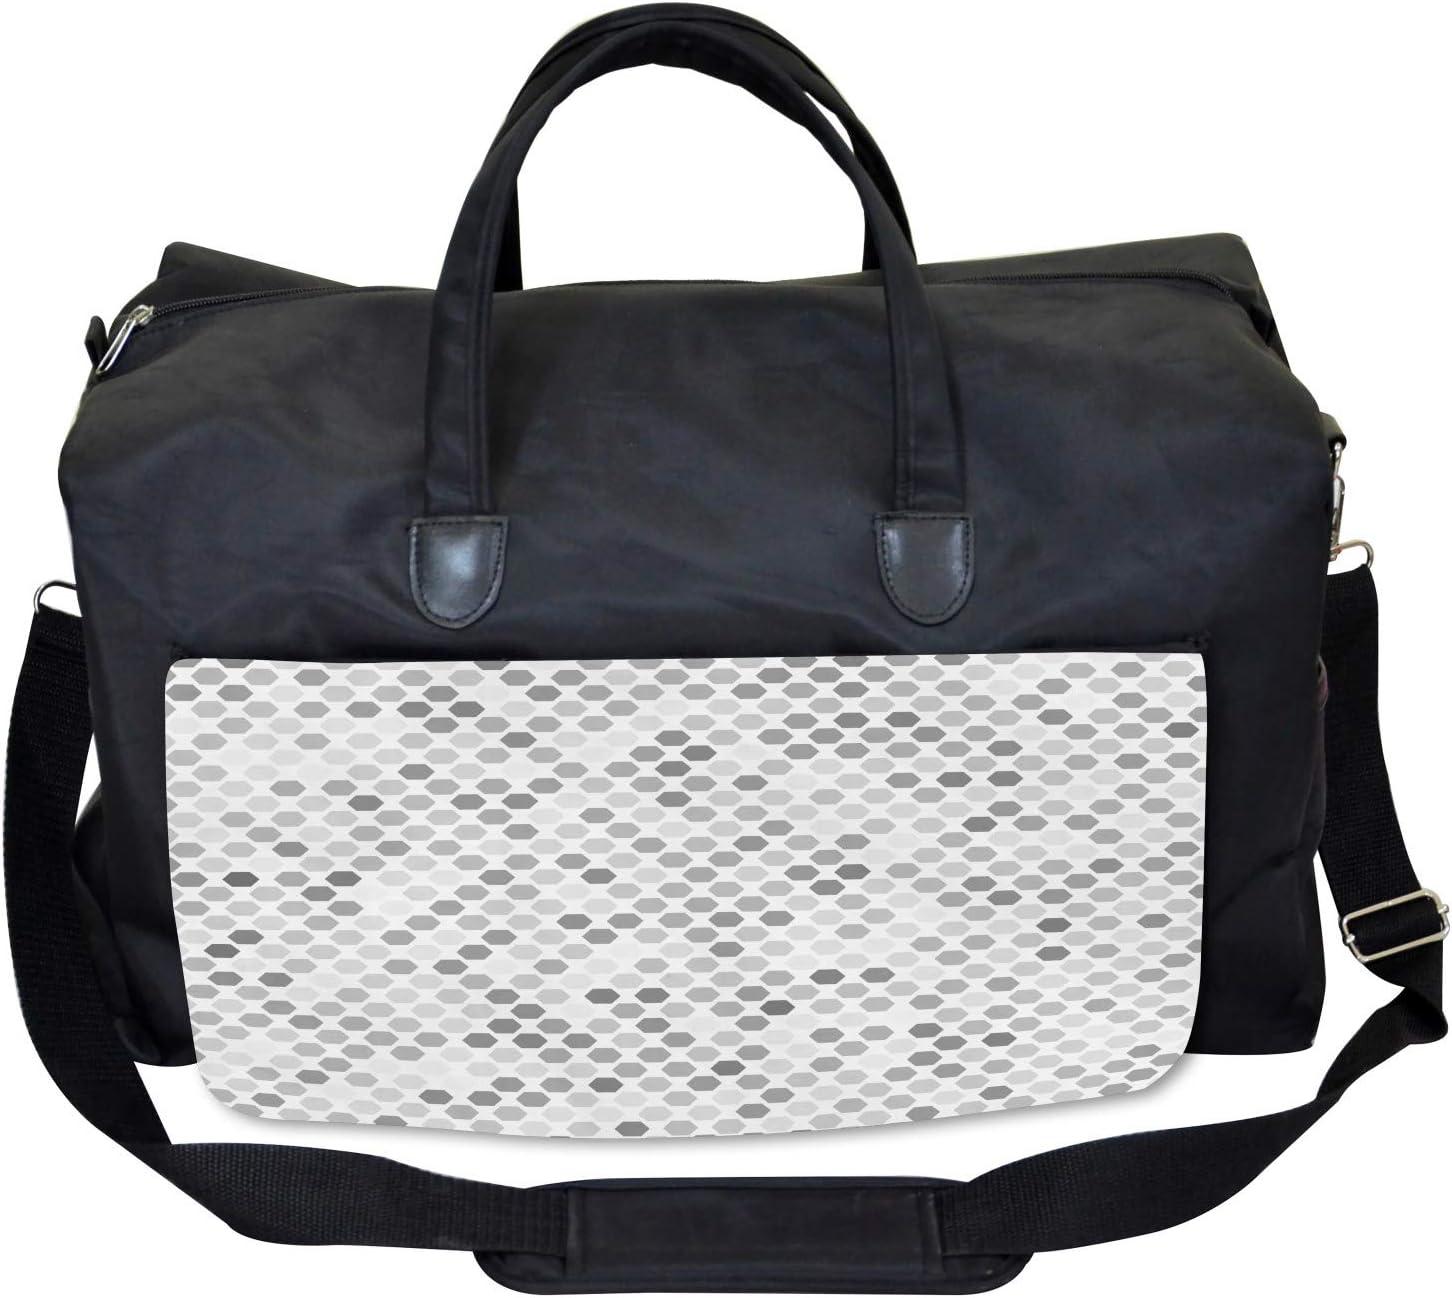 Ambesonne Gym Bag Zig Zag Hexagon Large Weekender Carry-on